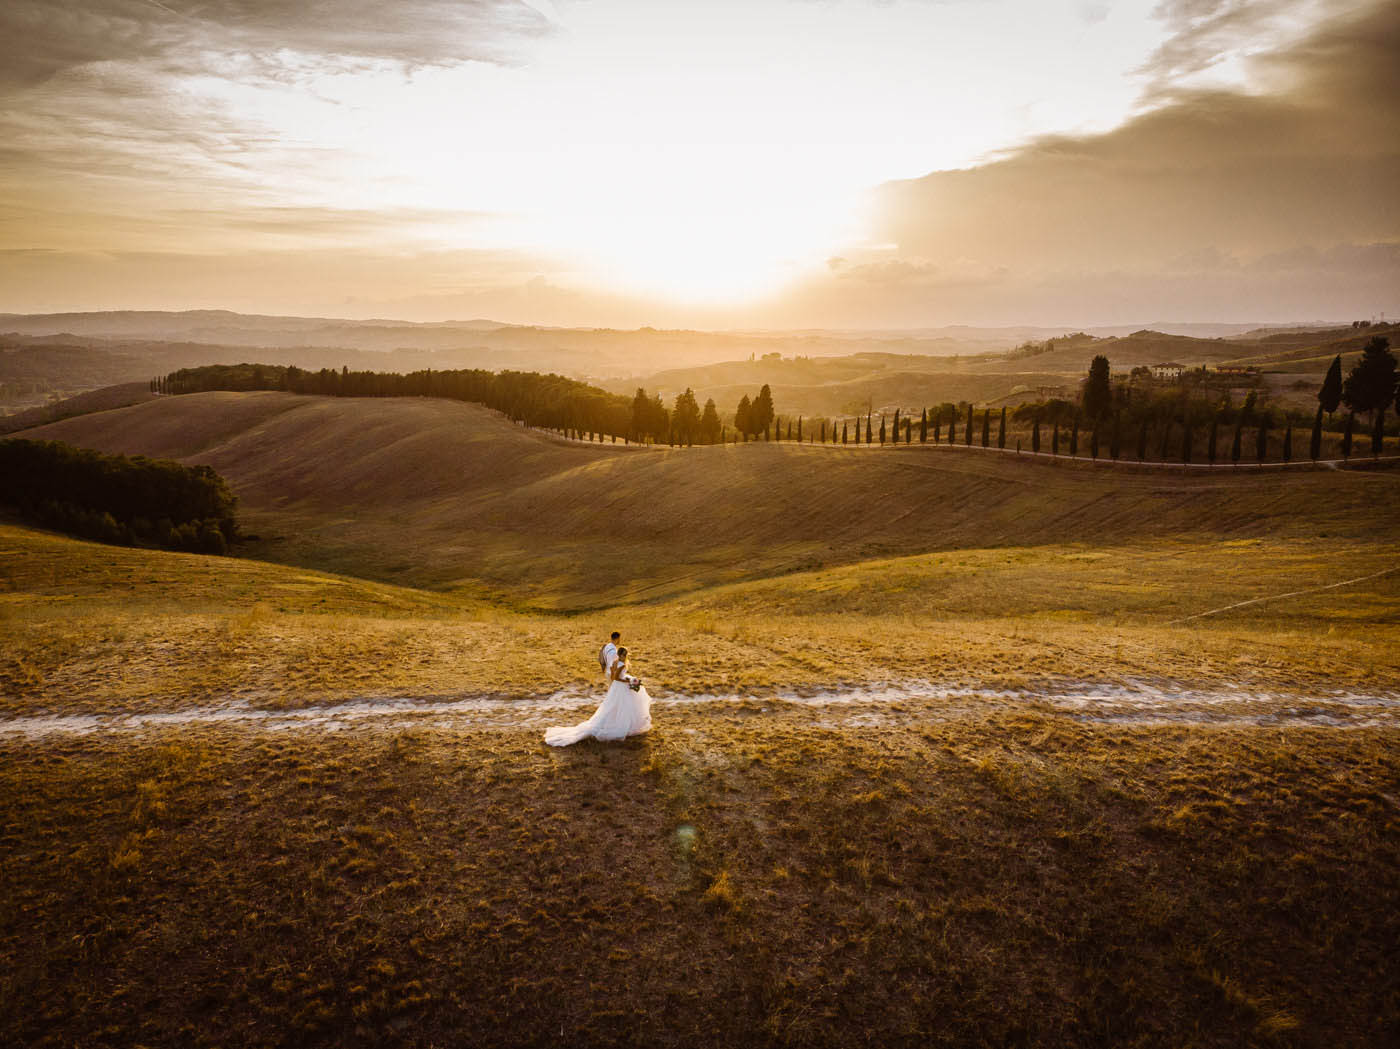 Miglior Fotografo Matrimonio 2021